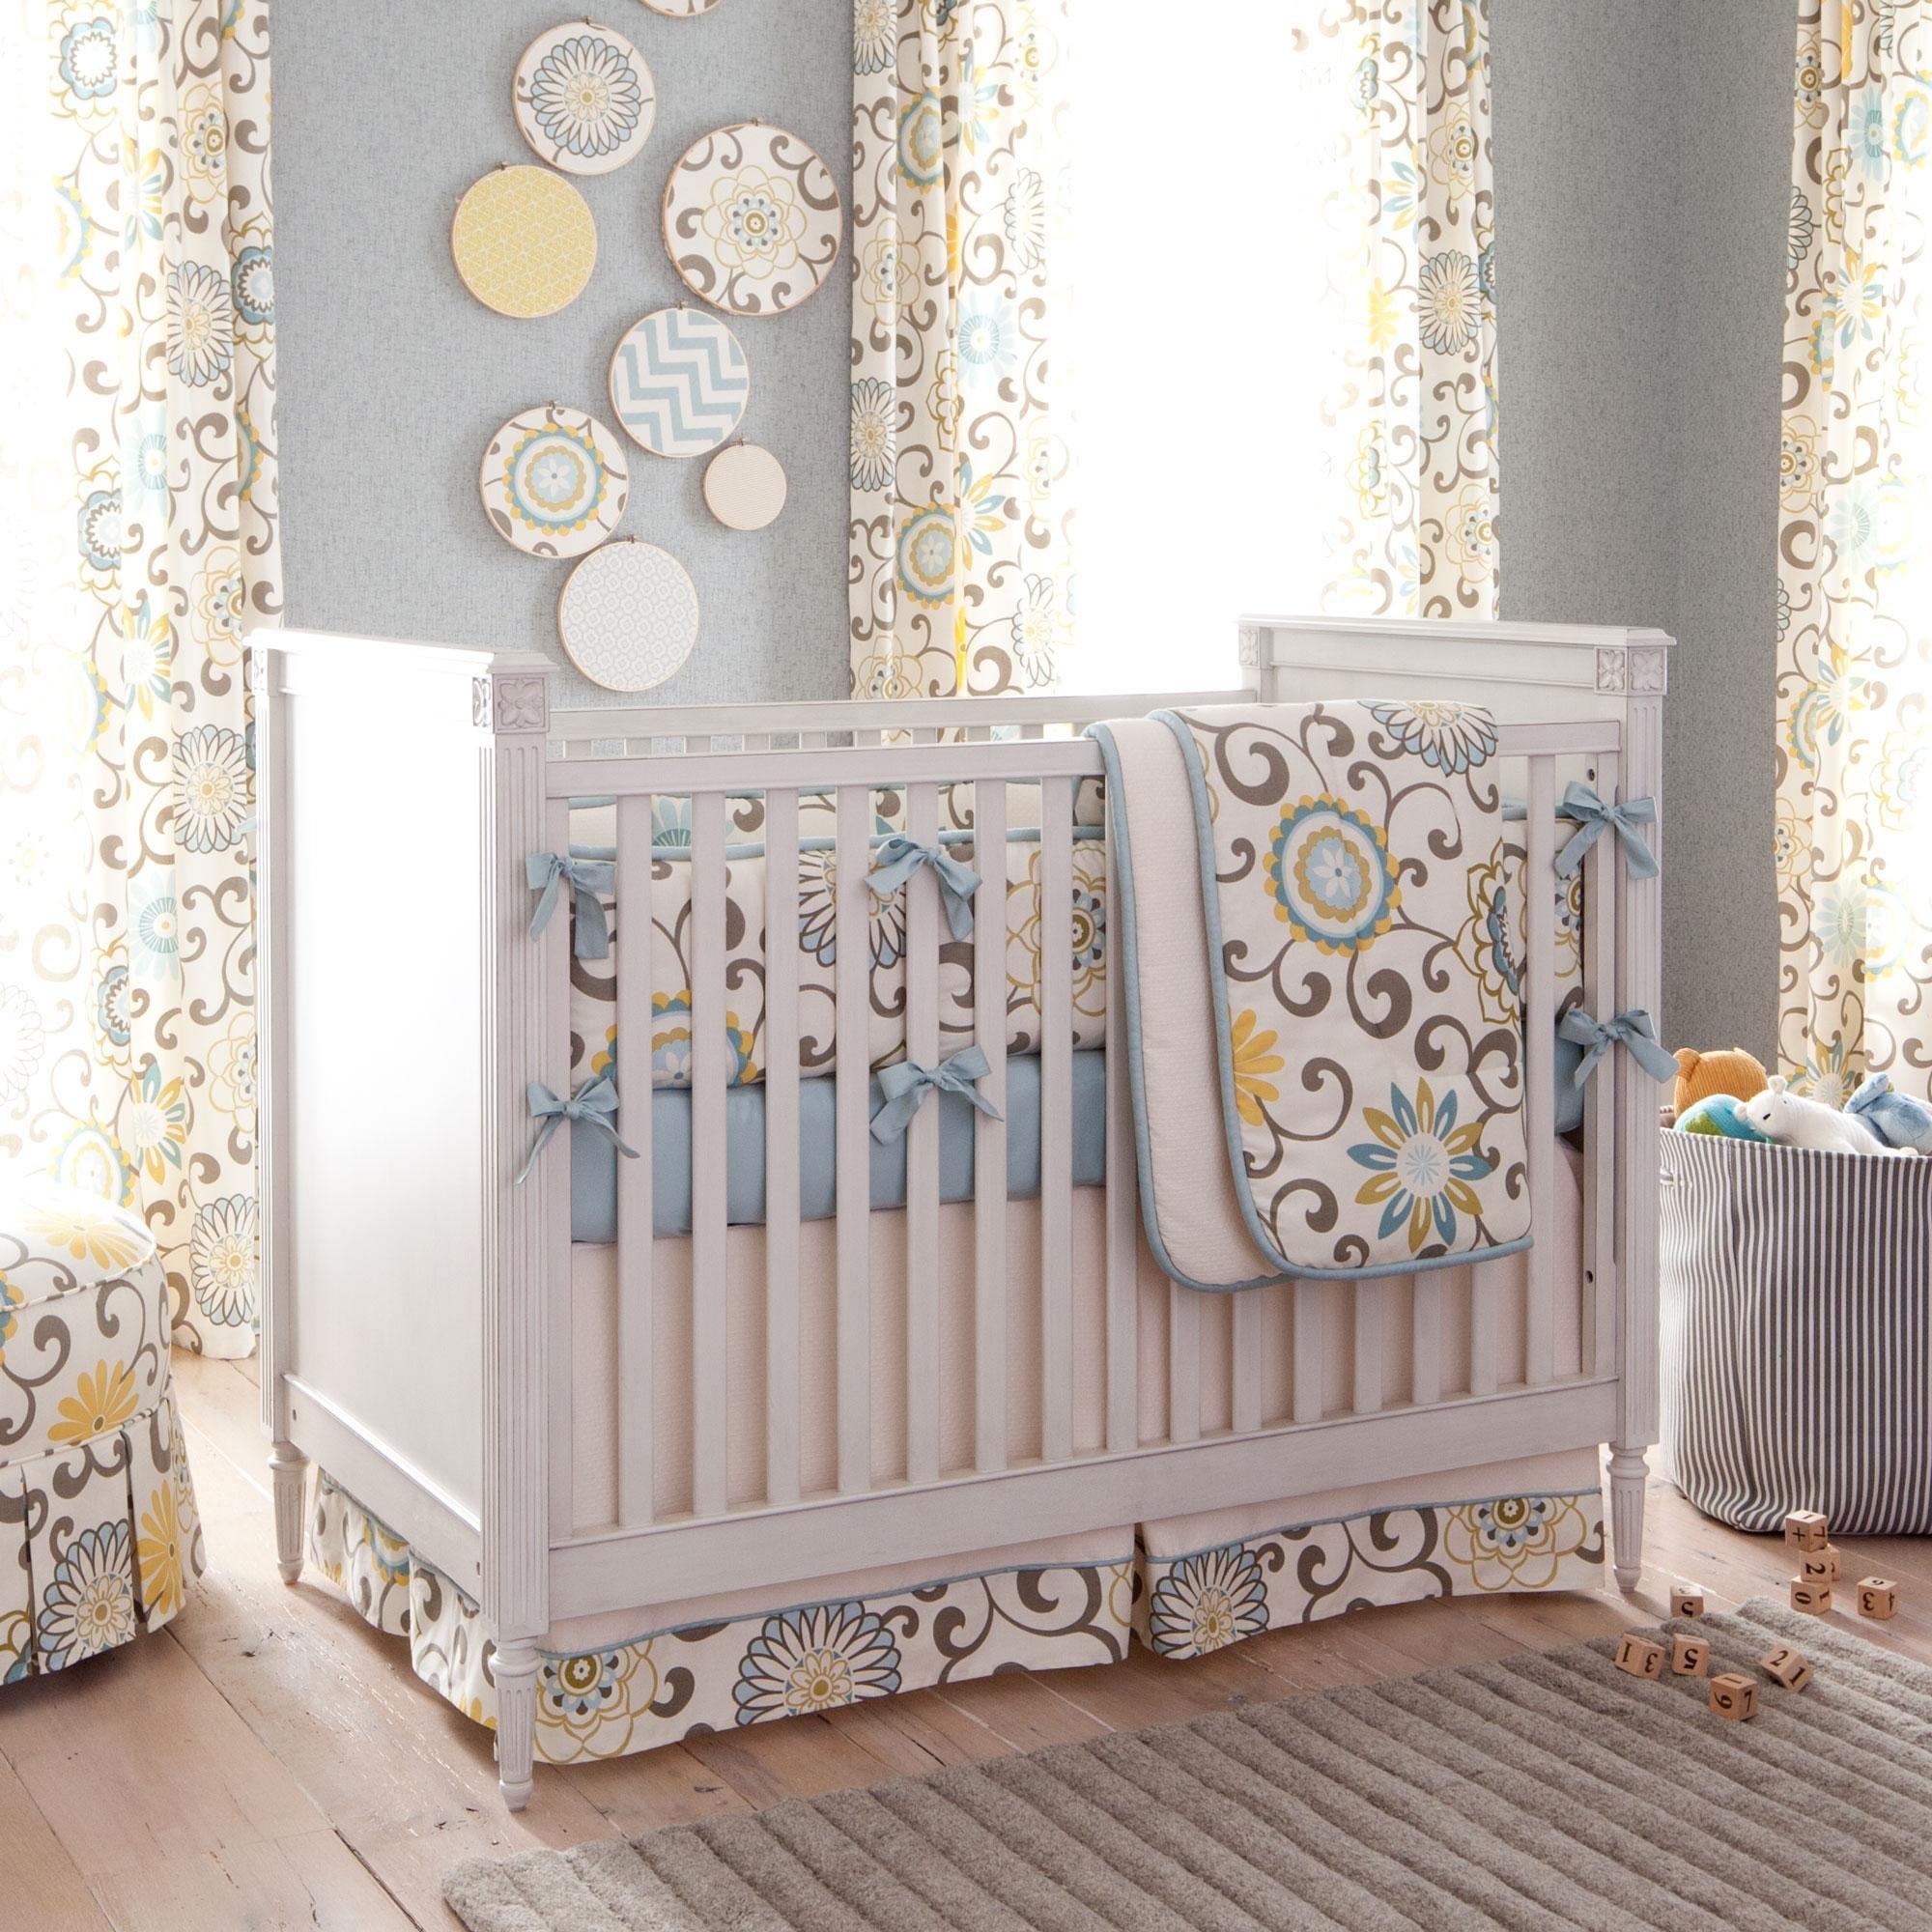 Carousel Designs Spa Pom Pon Play 3-Piece Crib Bedding Set